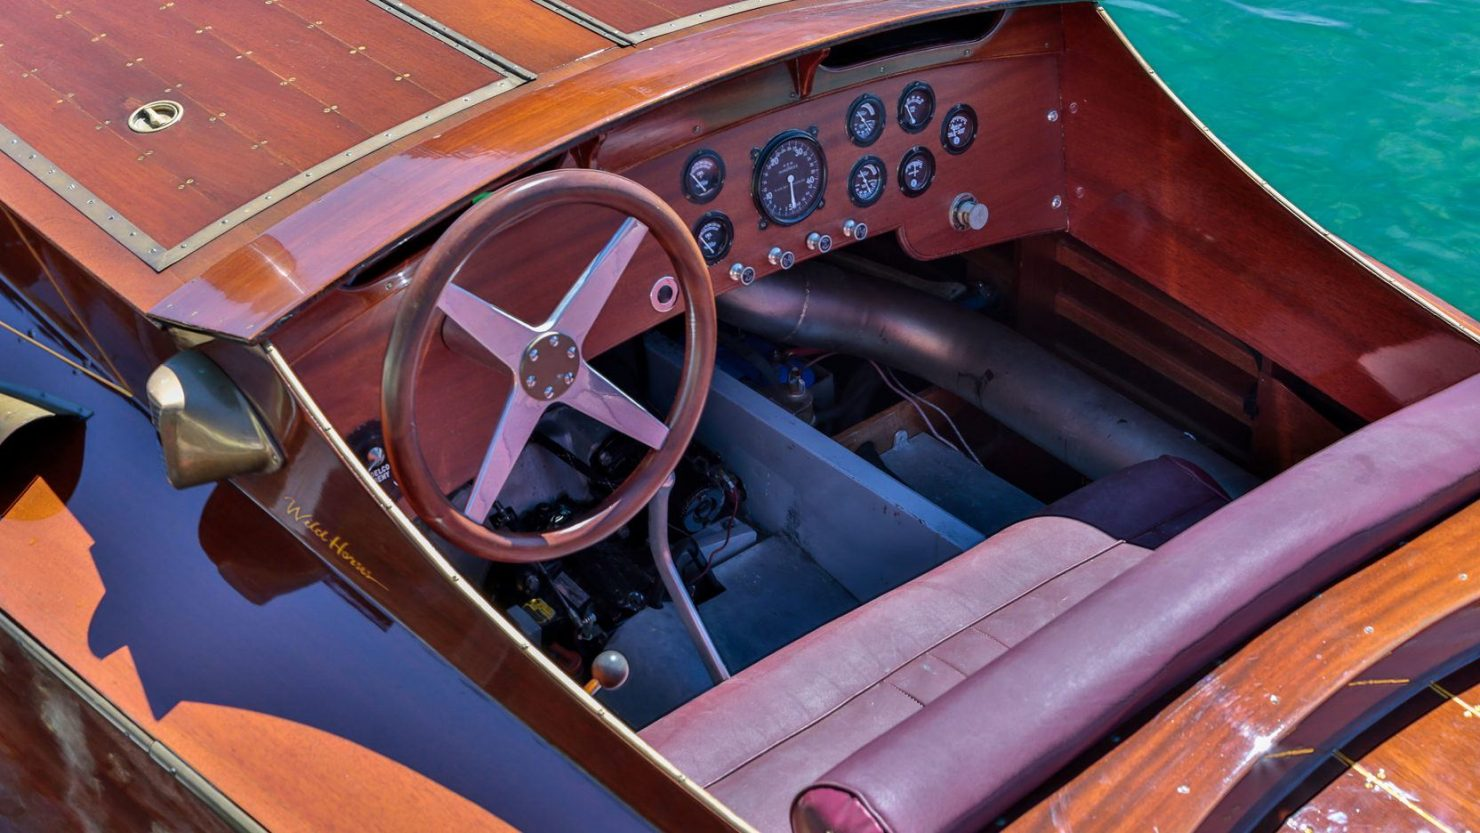 mahogany speed boat 7 1480x833 - 27 Liter V12 Brown & Bassett Gentleman's Racer